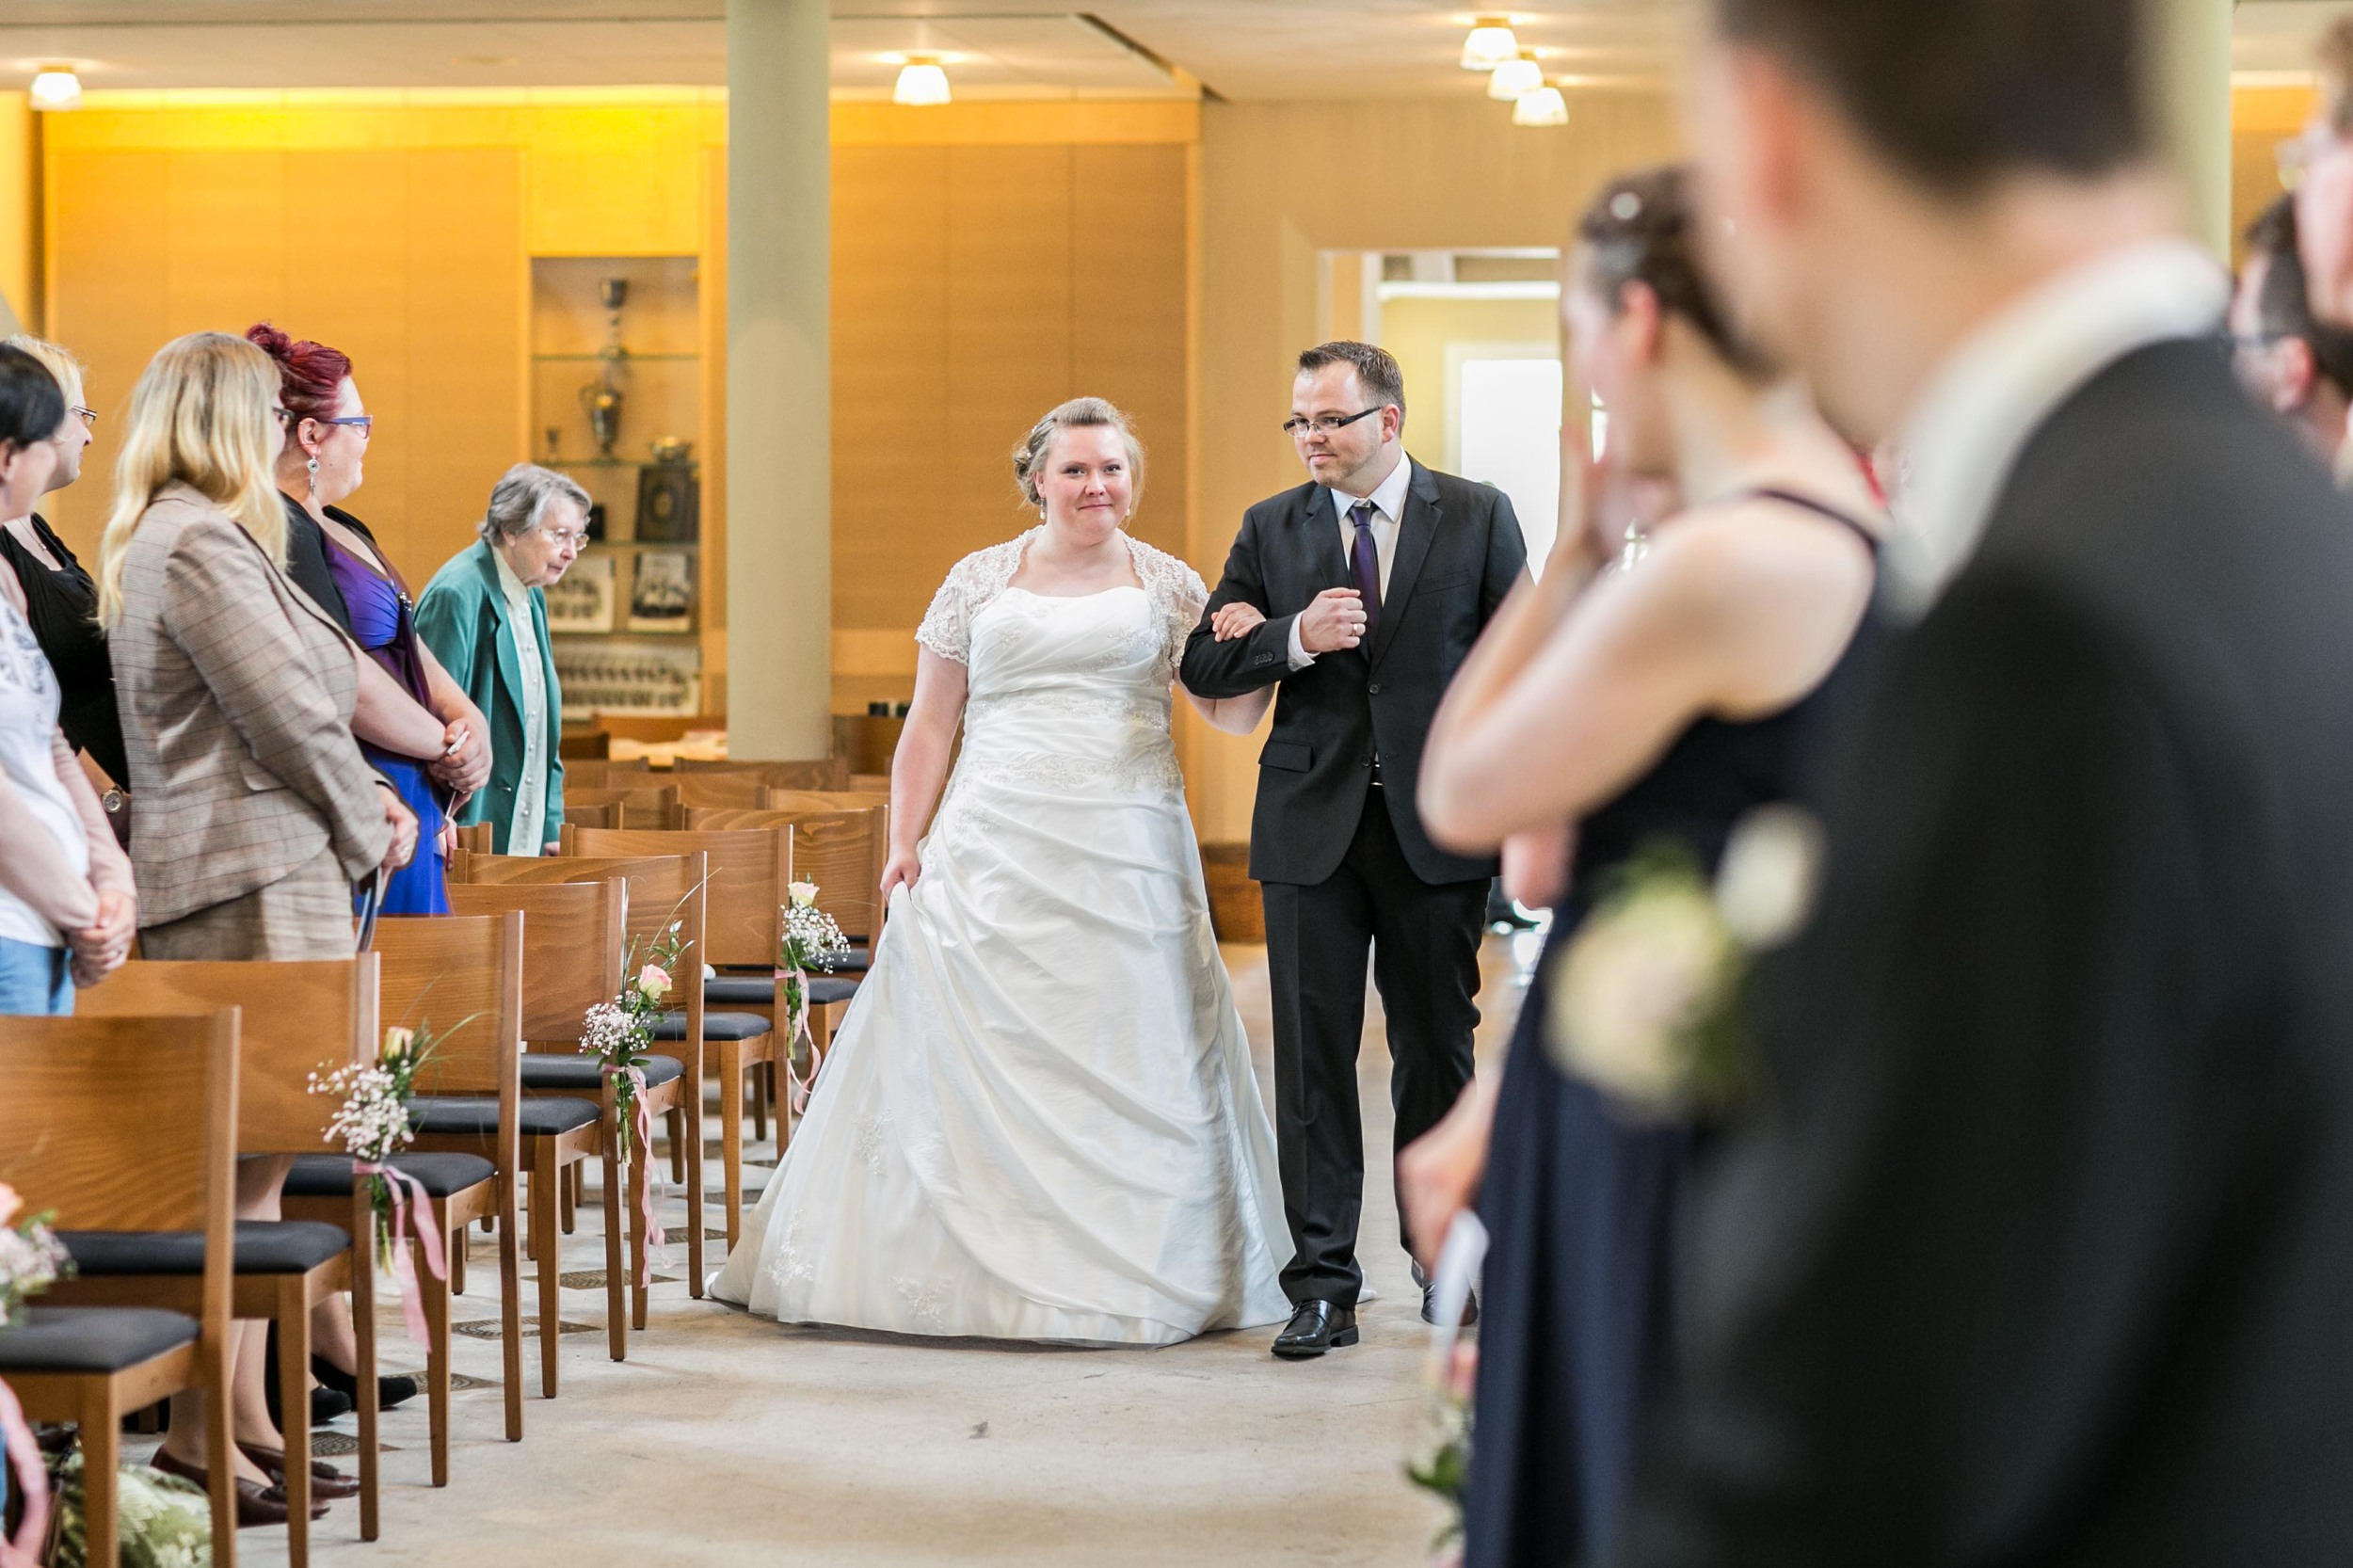 Berlin Hochzeitsfotografie_Fran Burrows-110.jpg